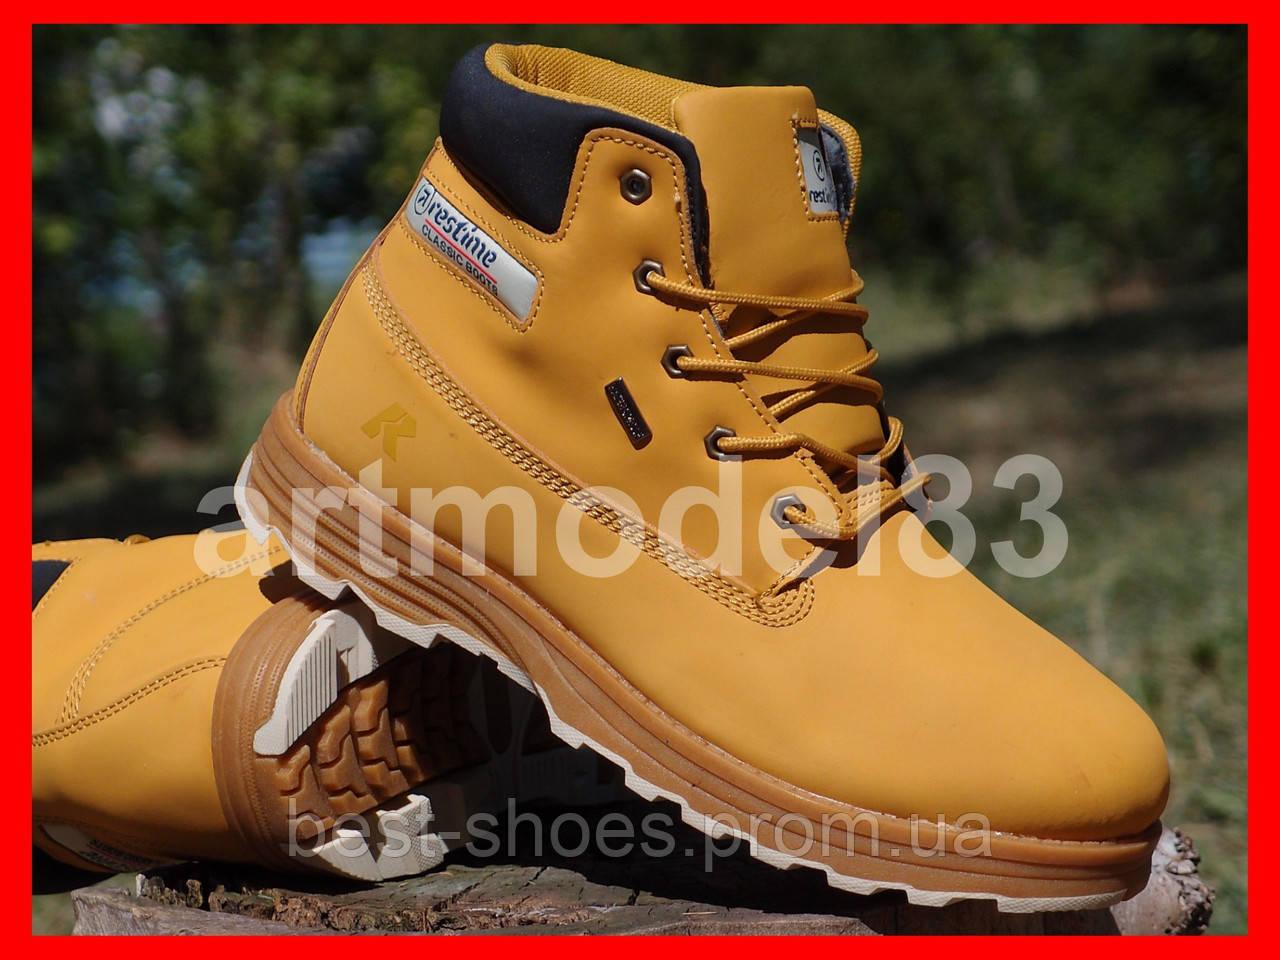 Кроссовки зимние мужские ботинки сапоги restime yellow boots waterproof  41-44 - ARTMODEL в Запорожье ea952550cbd